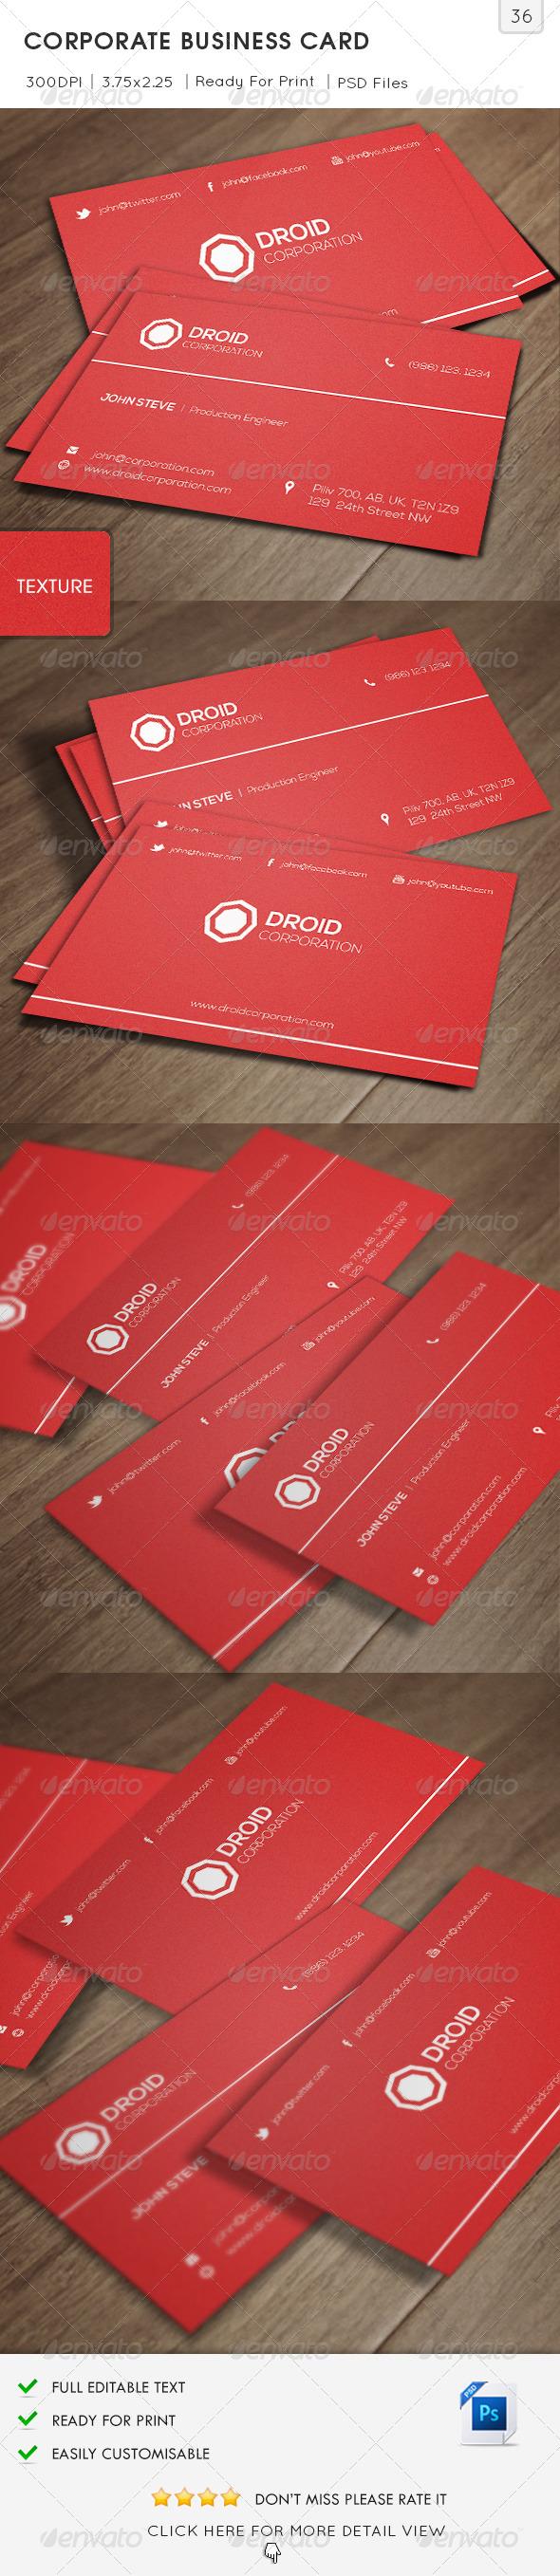 Corporate Business Card v36 - Corporate Business Cards